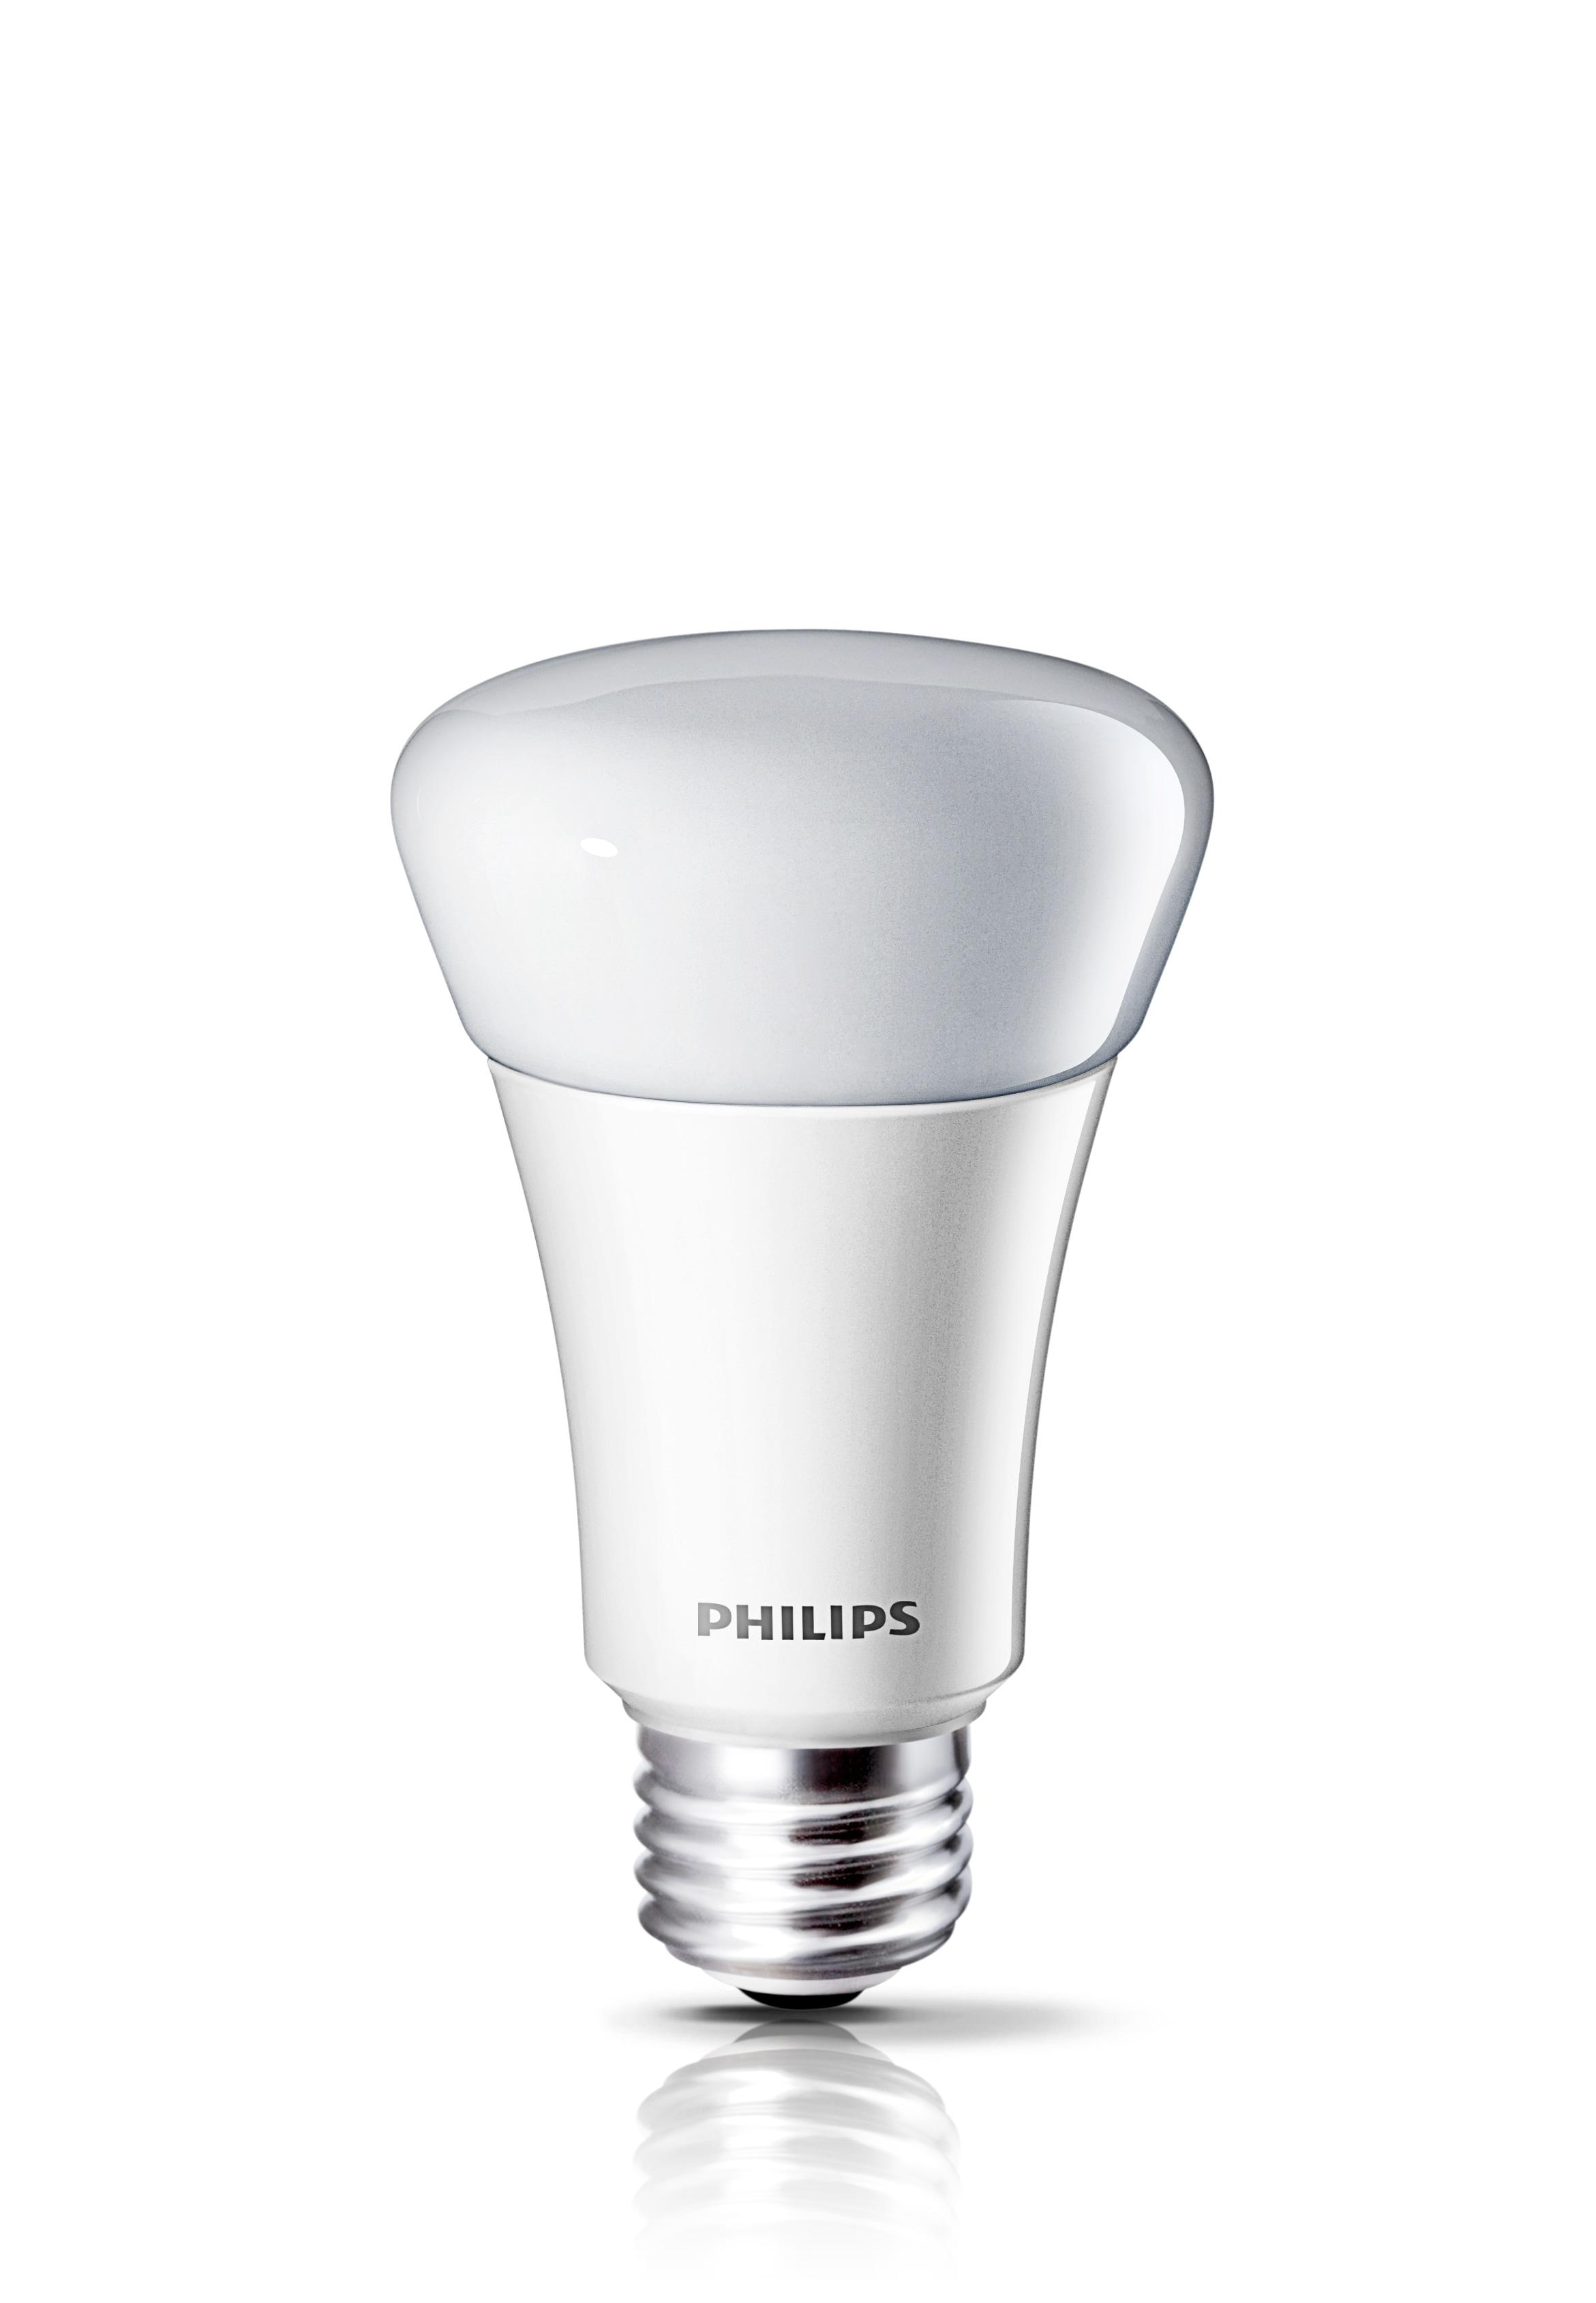 Philips%20New%20A19%20LED_Open%20View Schöne Philips Led Gu5 3 Dekorationen